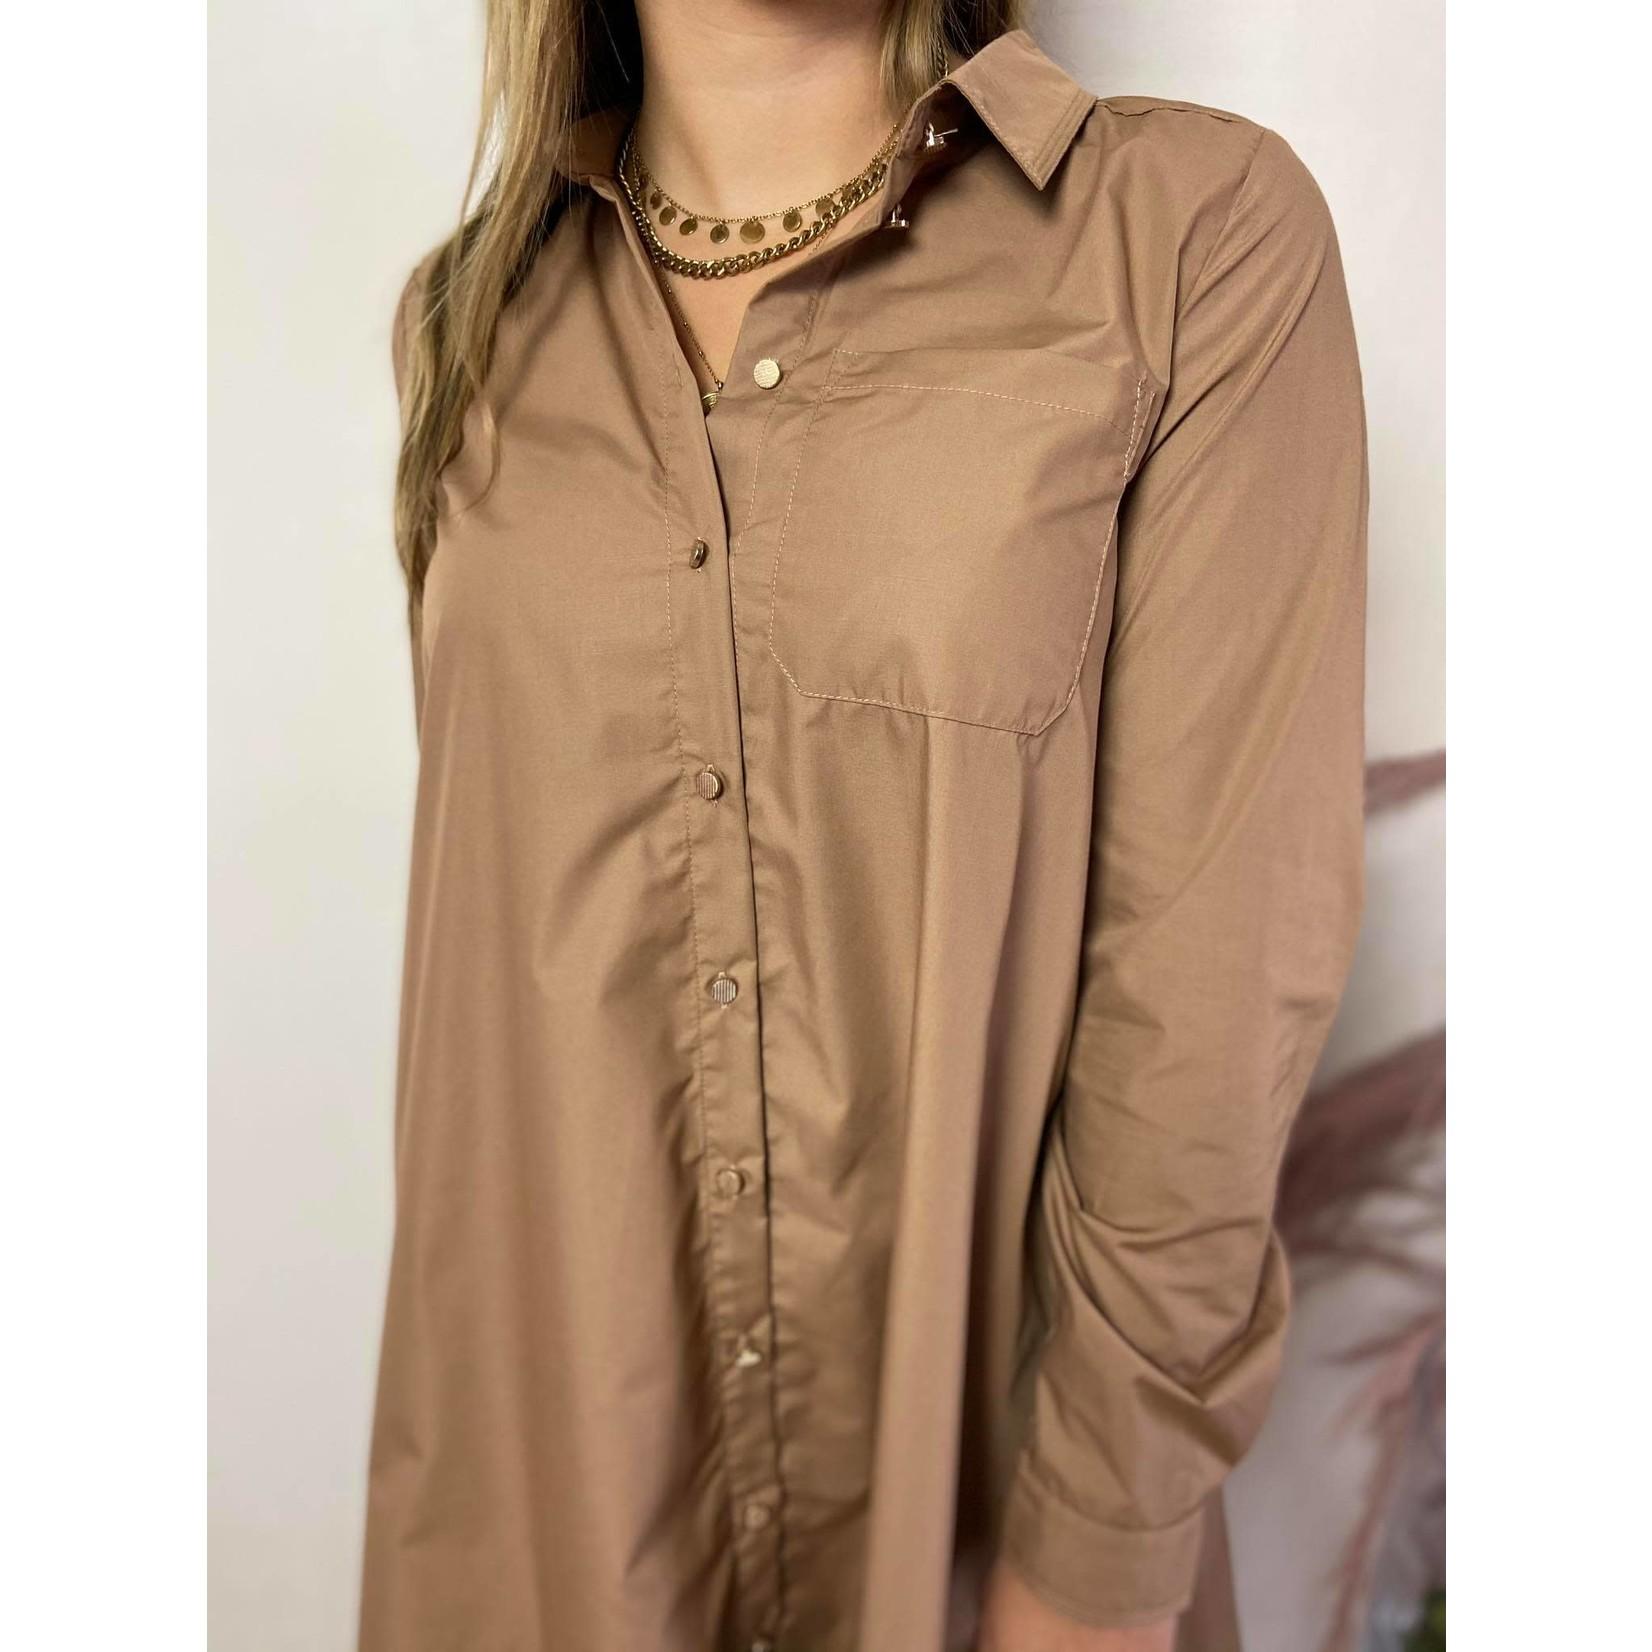 KAbeata shirt dress woodsmoke